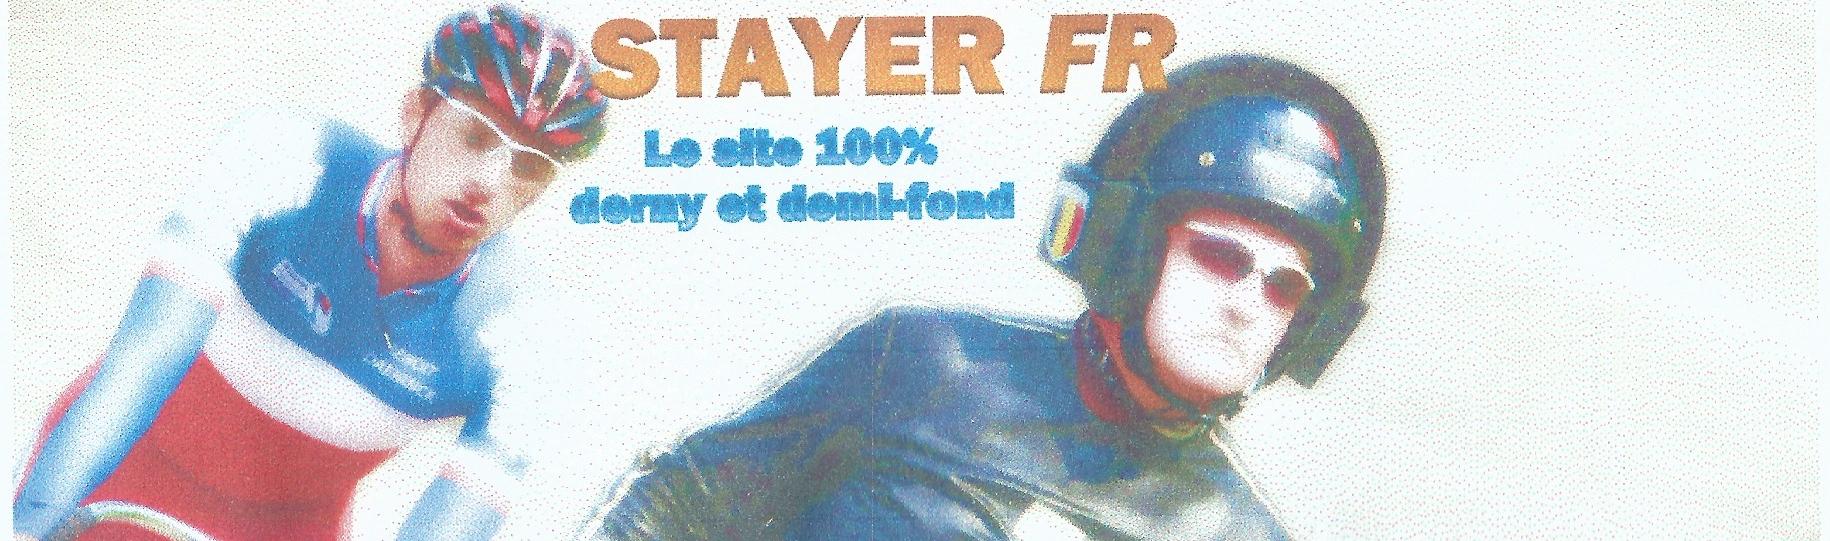 STAYER -FR :  Le blog 100 % demi-fond et  derny